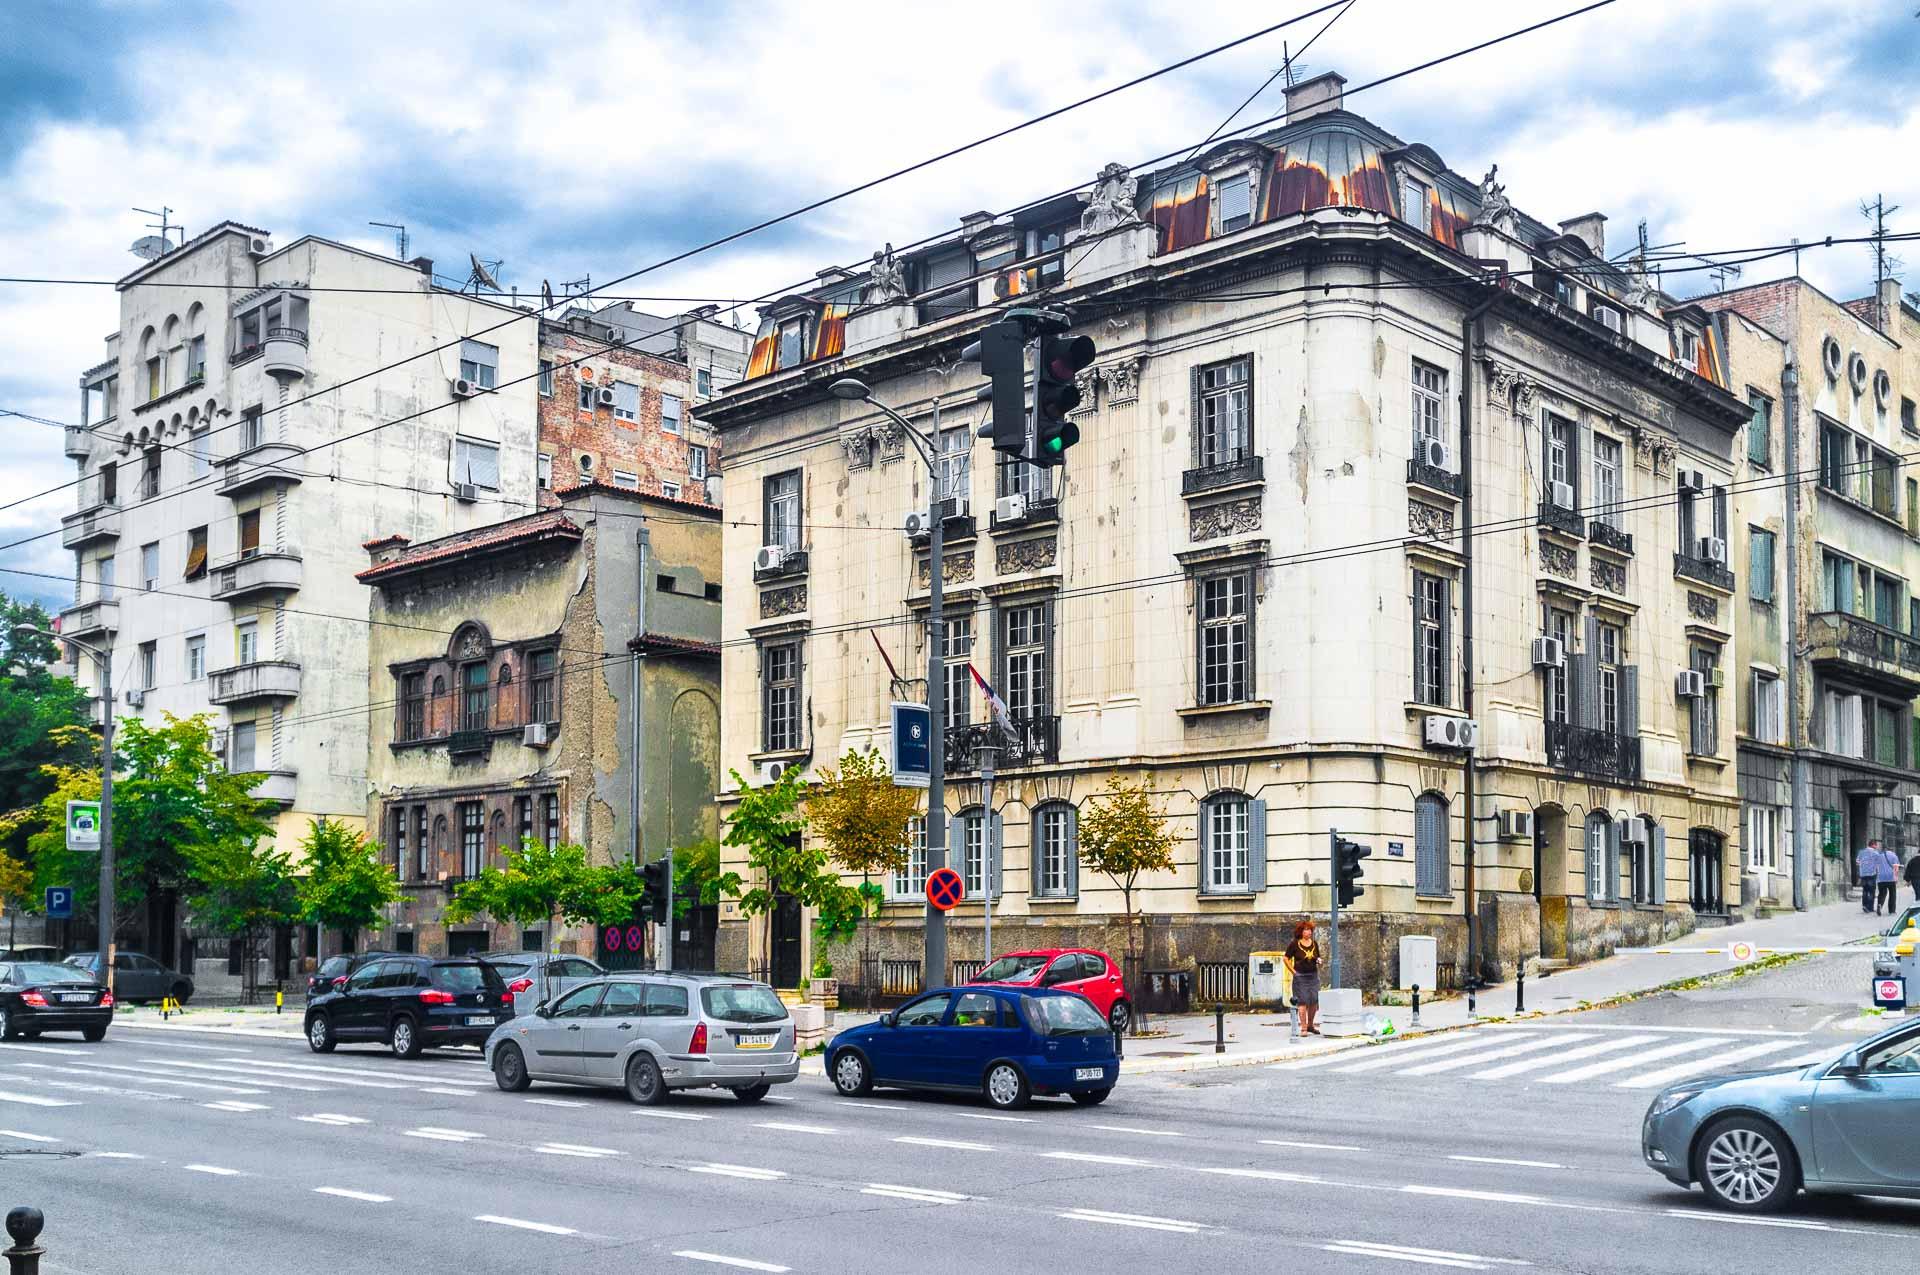 08-22-Beograd-03